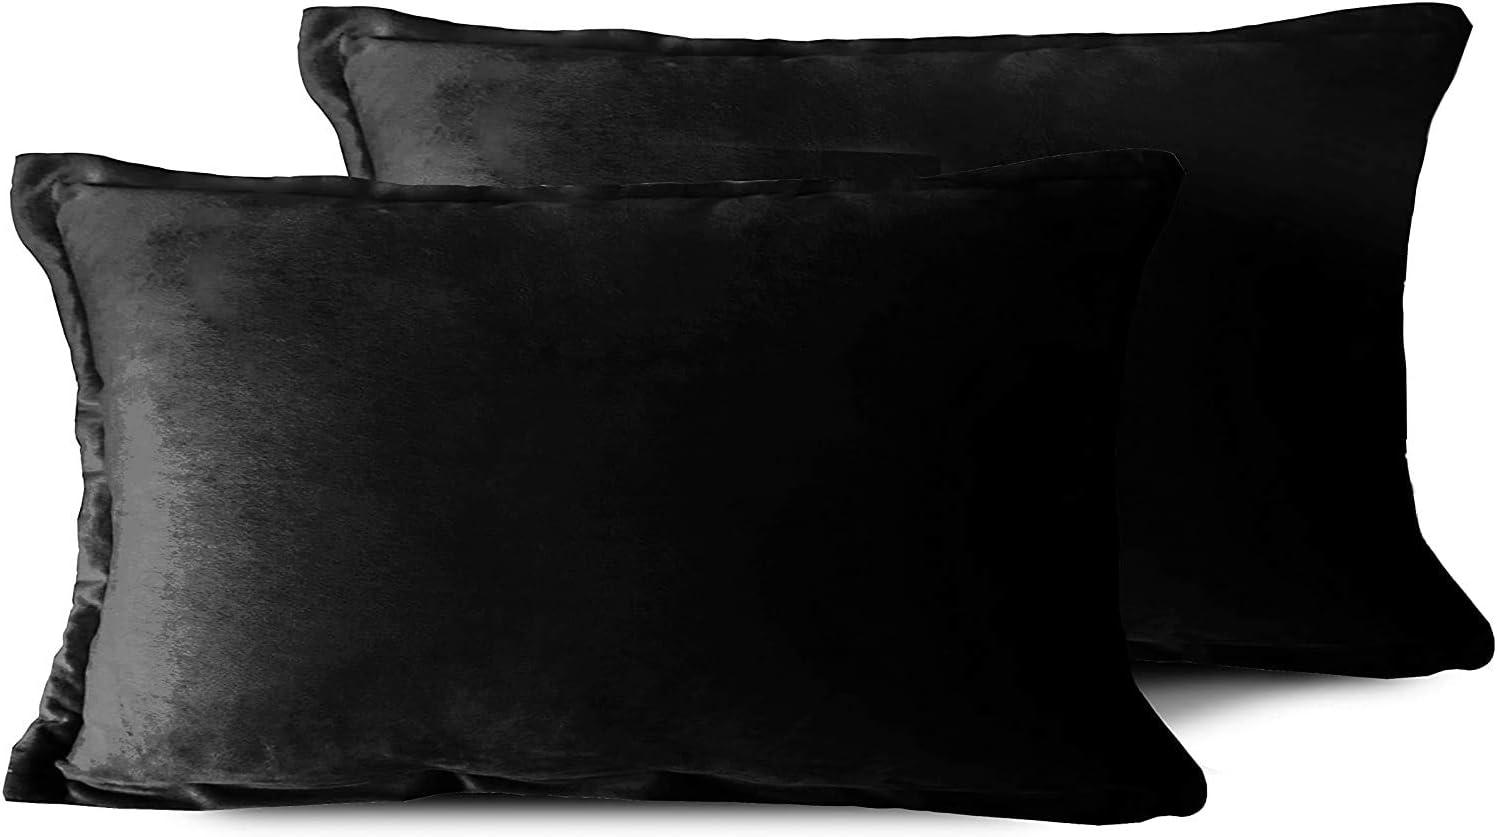 EIUE Soft Velvet Throw Albuquerque Mall Be super welcome Pillows Set 2 Decor Home S Decorations of